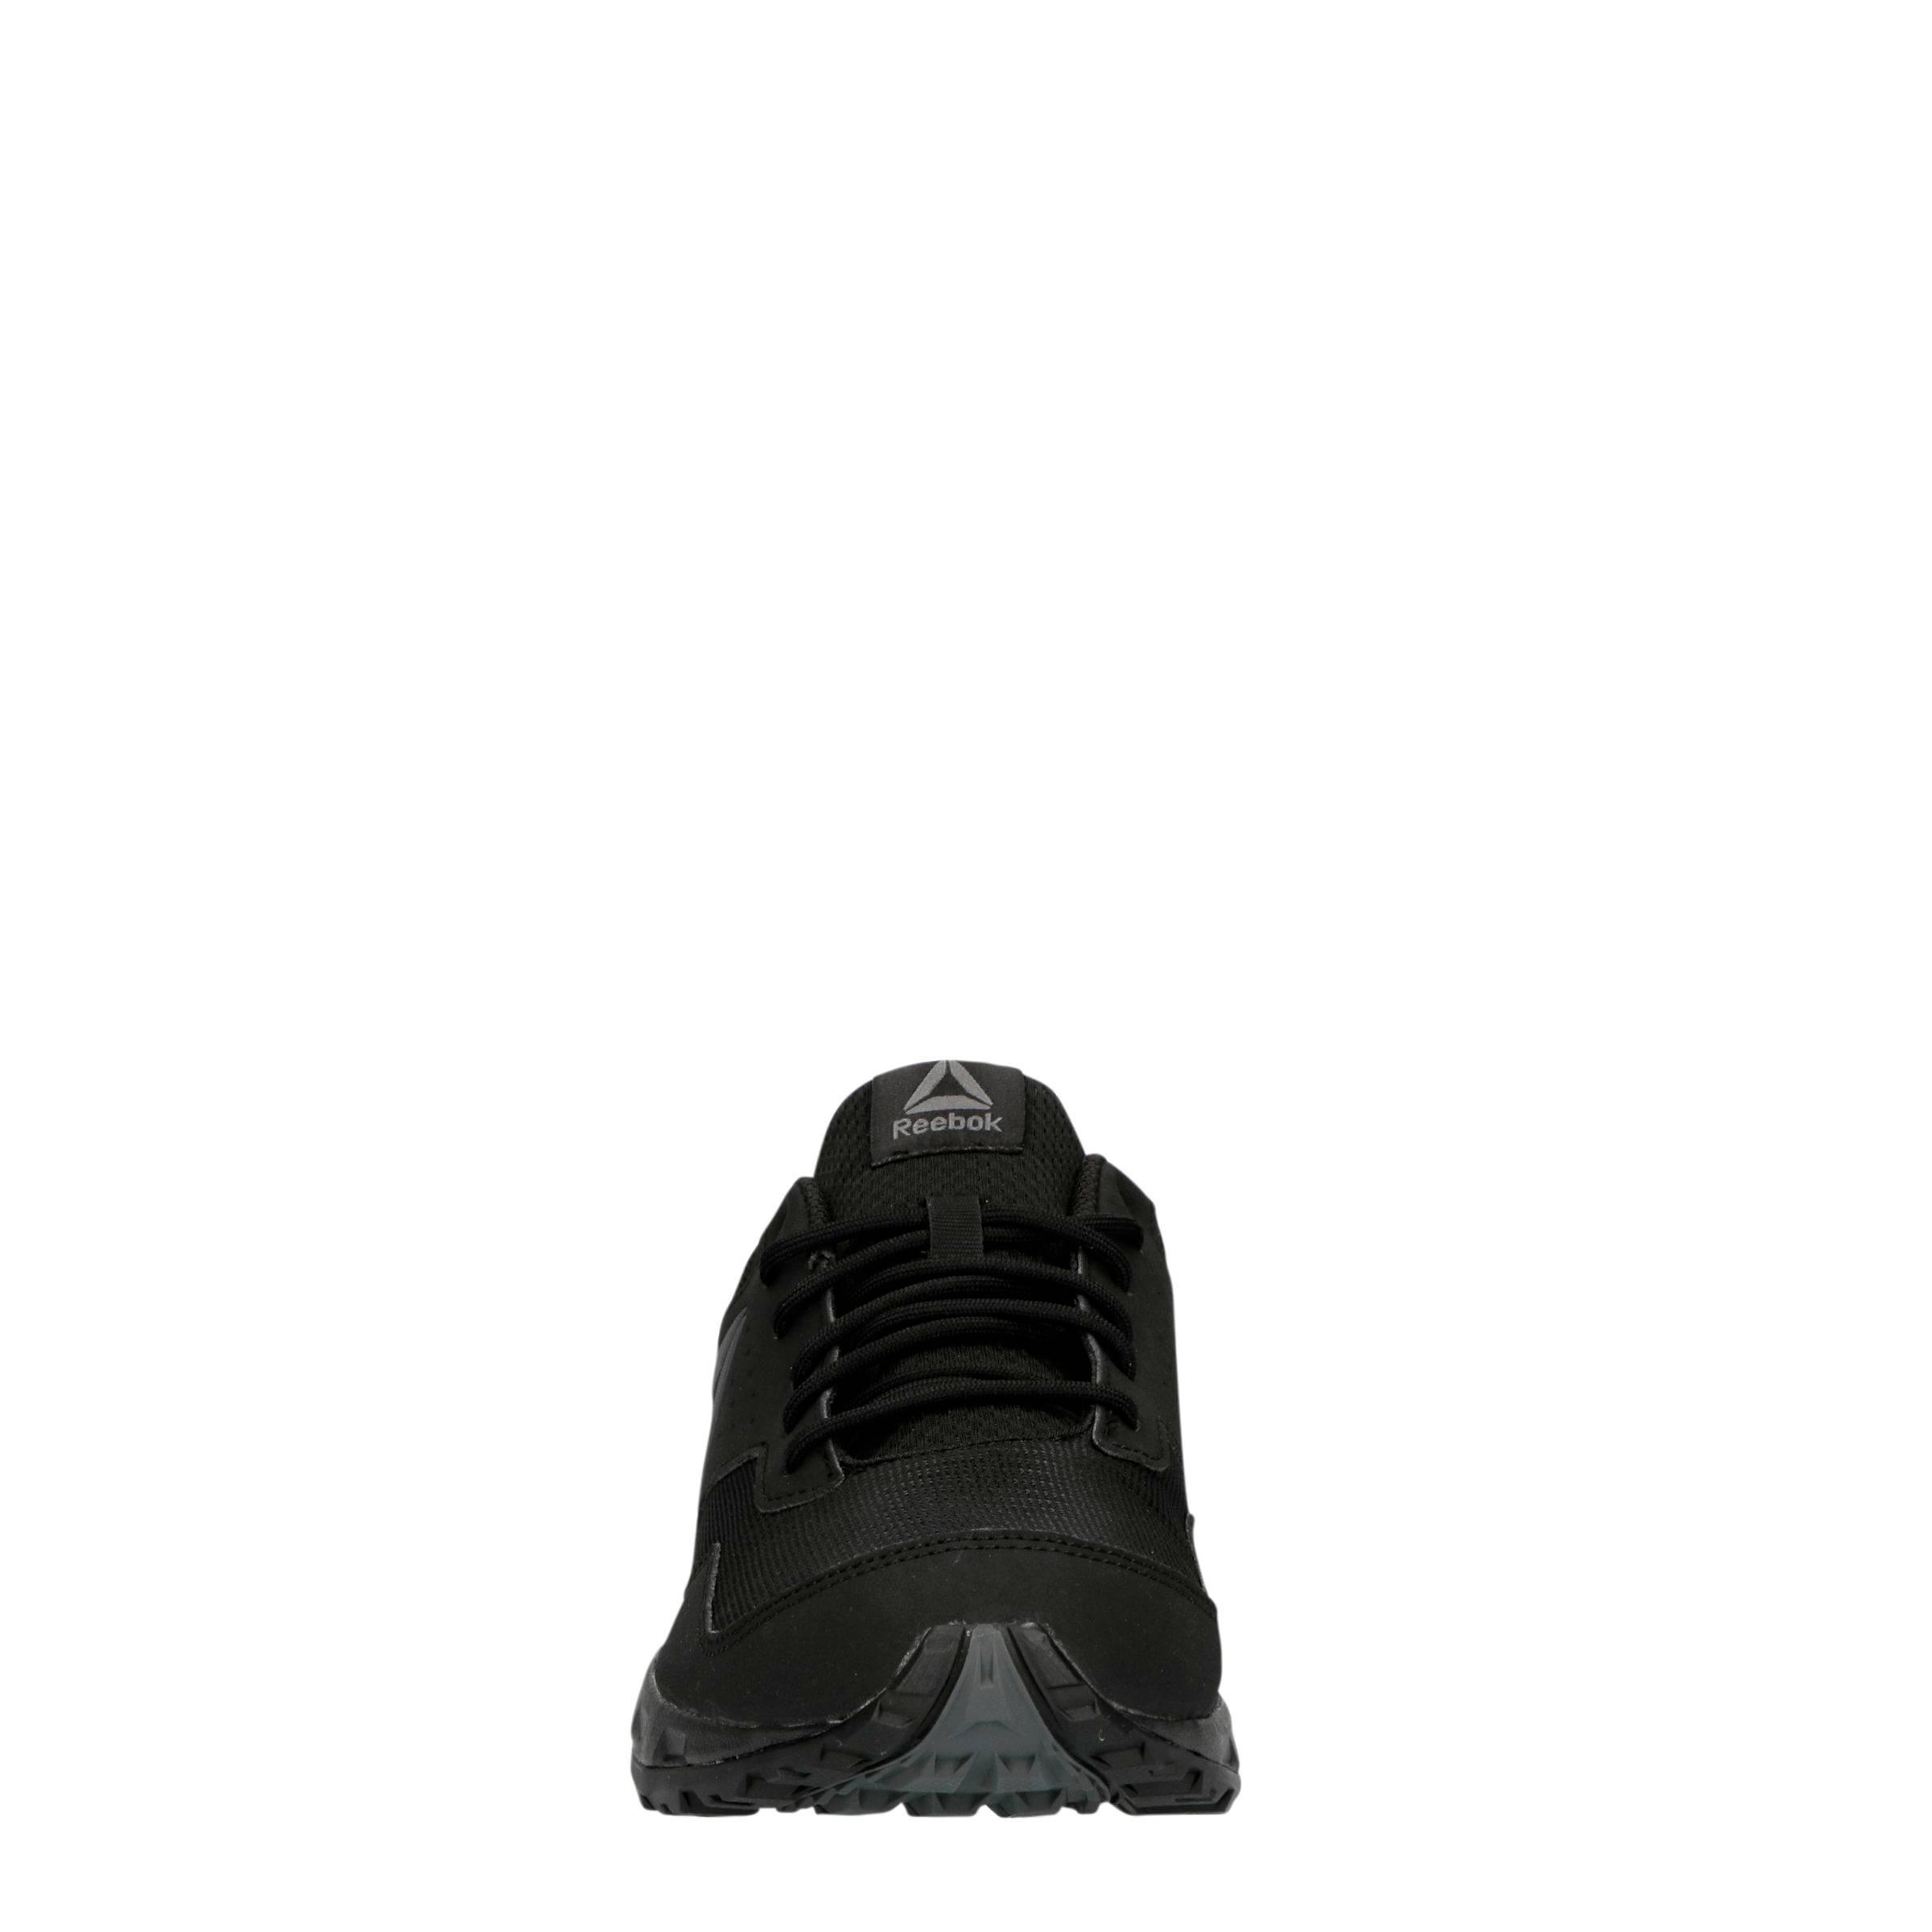 Reebok schoenen Ridgerider Trail 4 GTX zwartgrijs